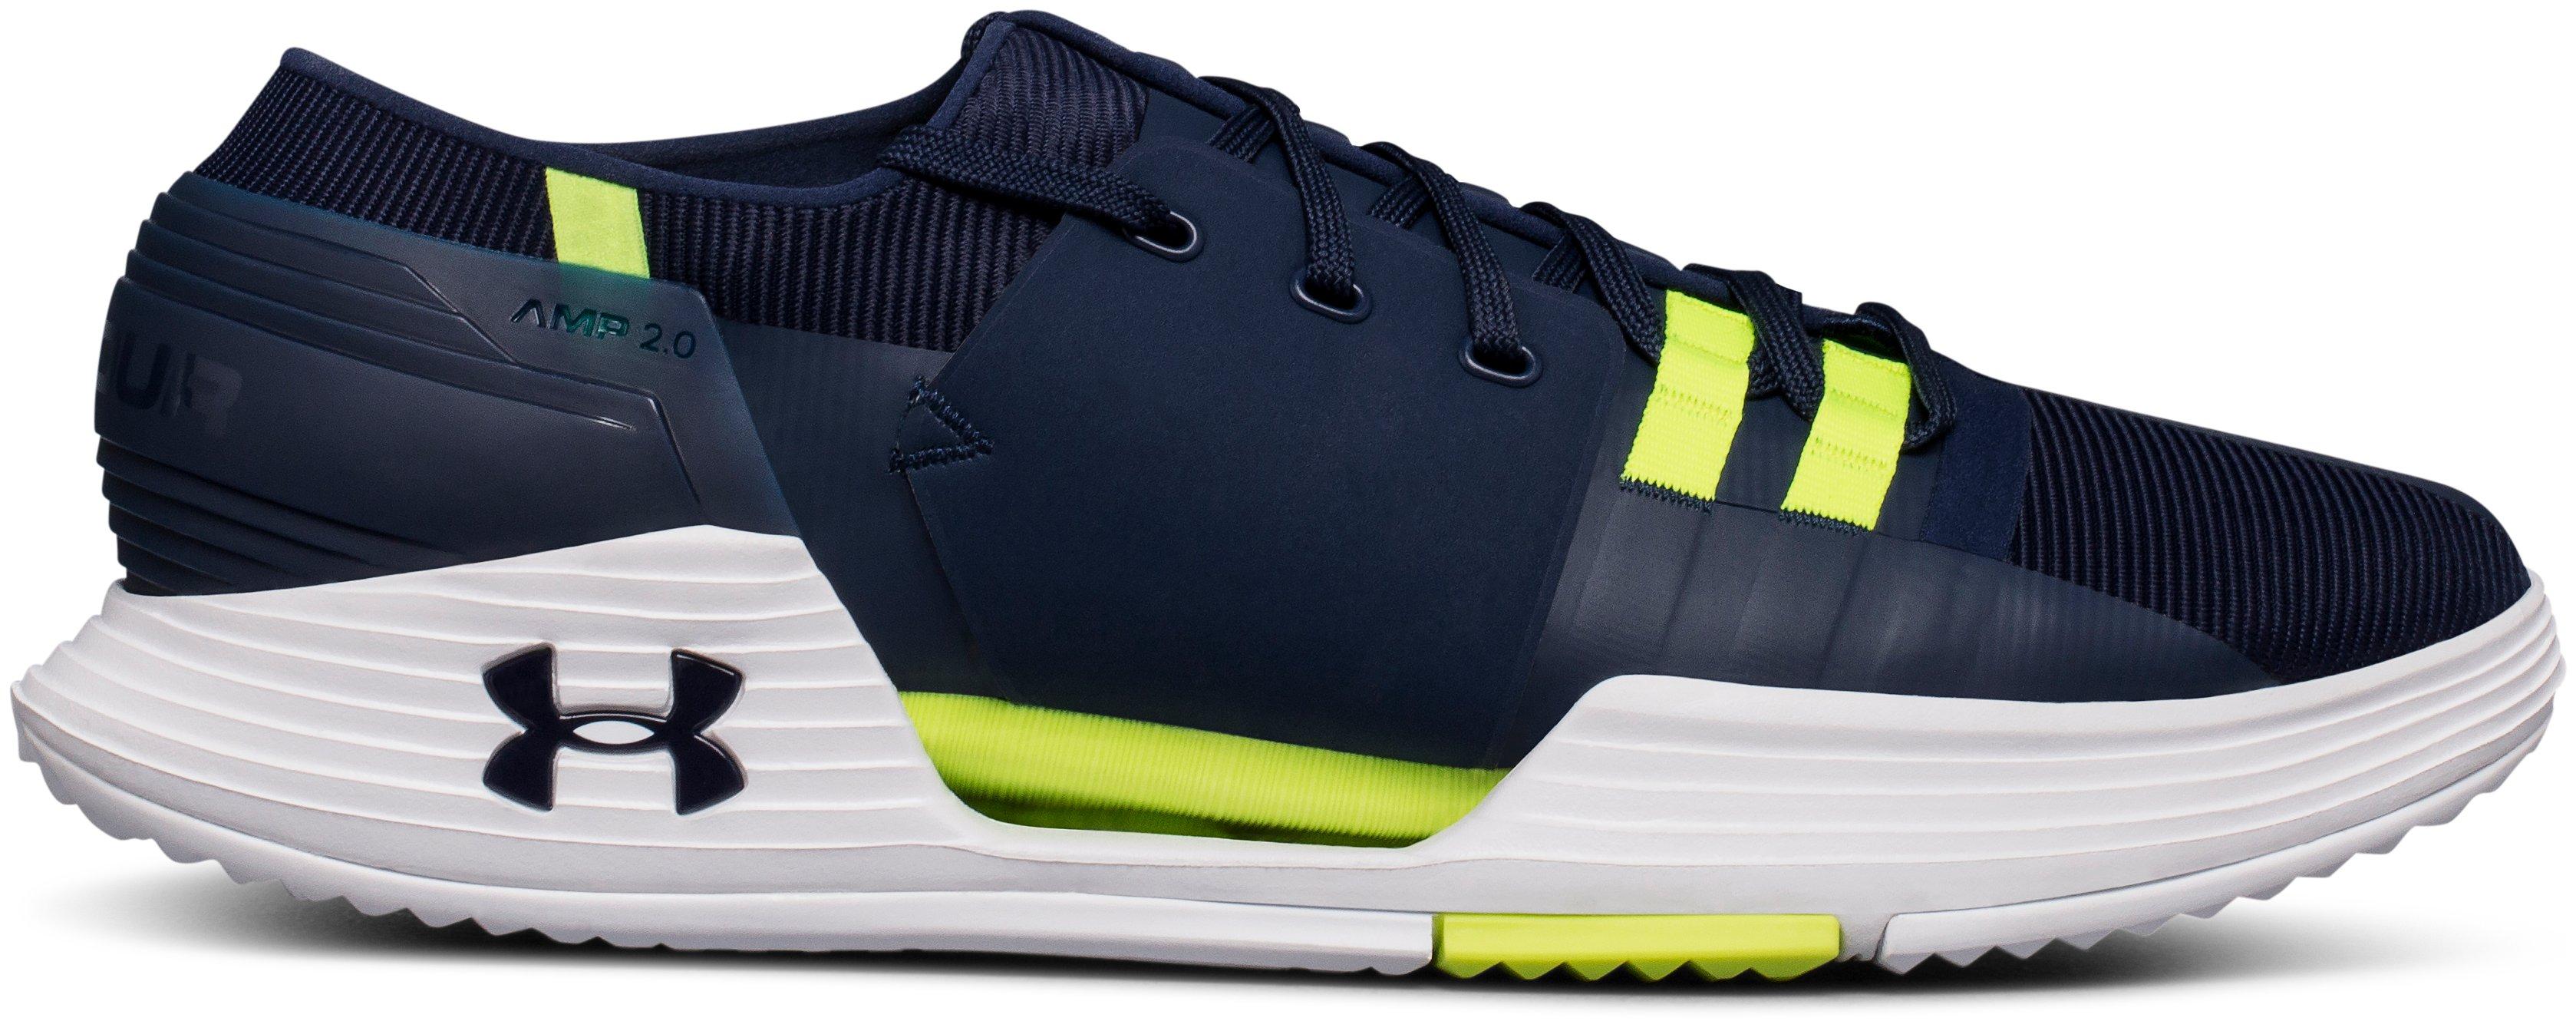 SPEEDFORM AMP 2.0 - Sports shoes - academy